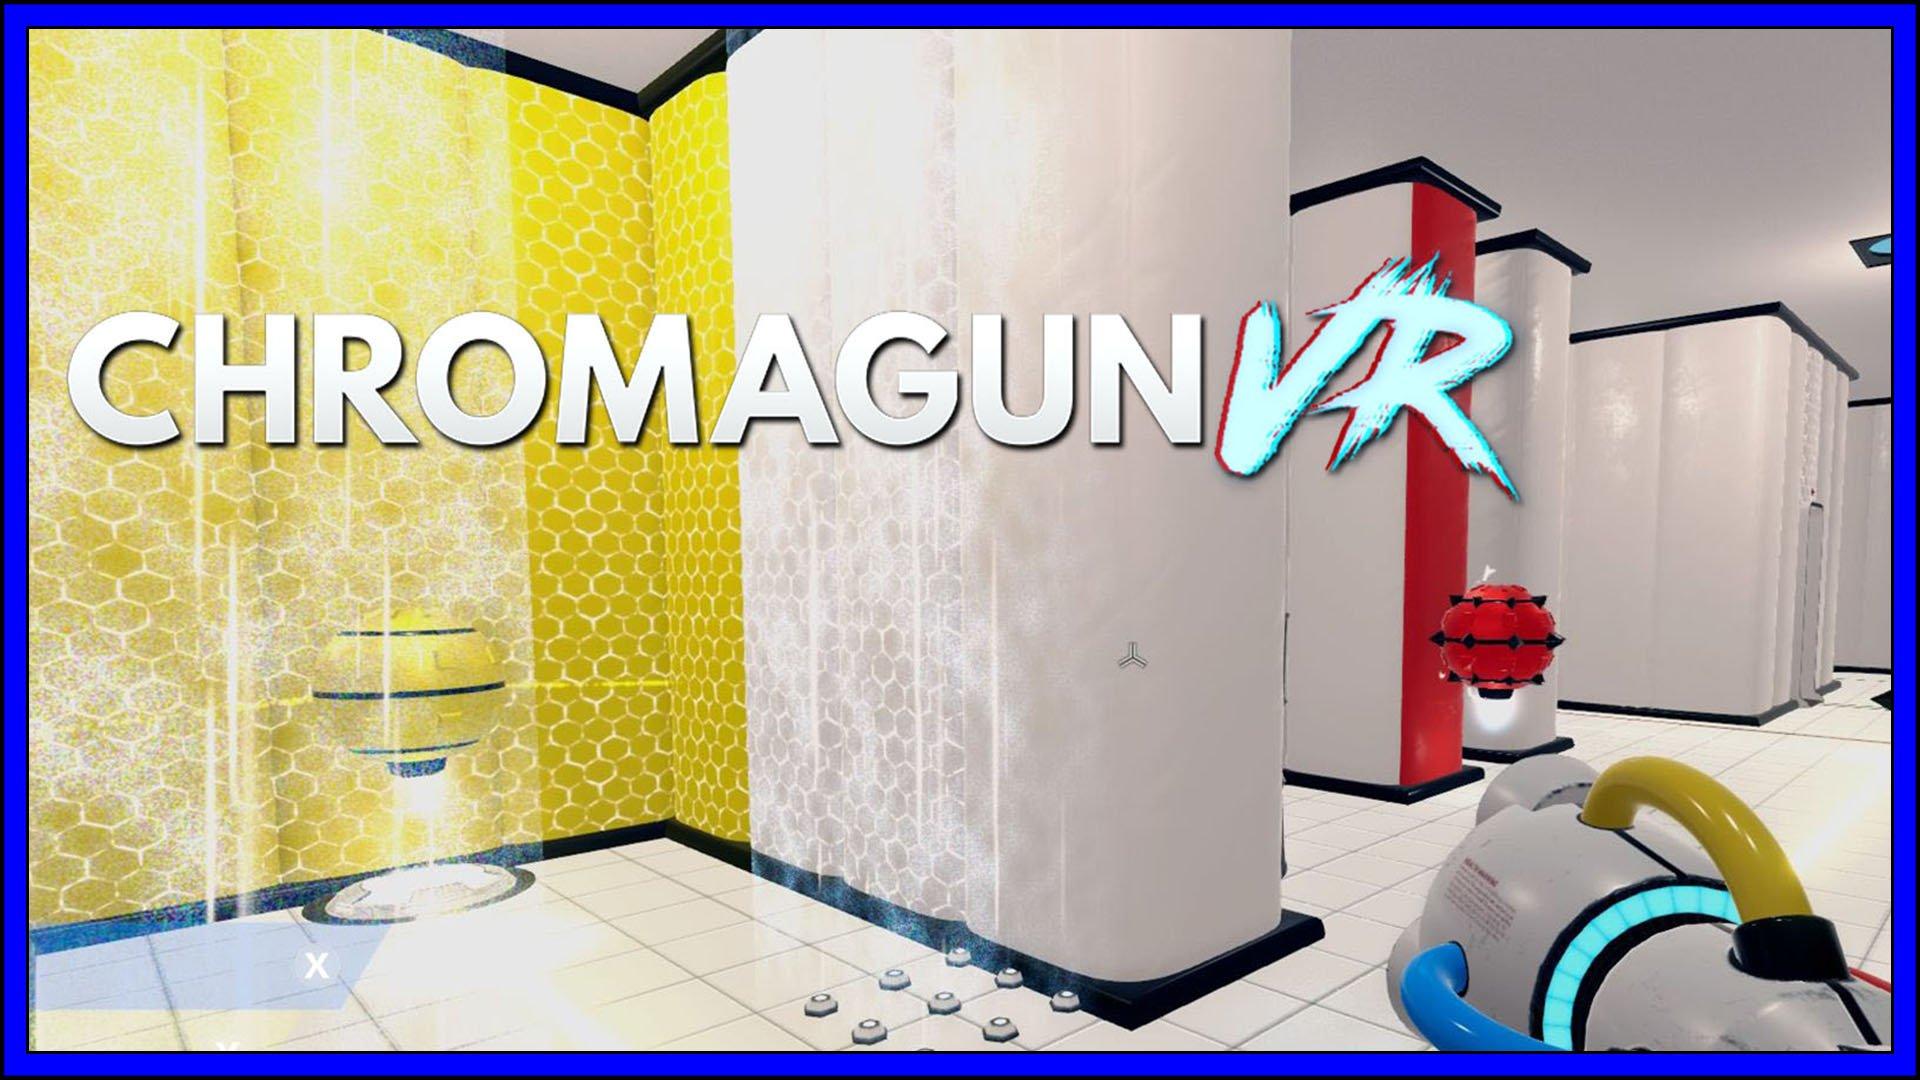 Chromagun VR Fi3